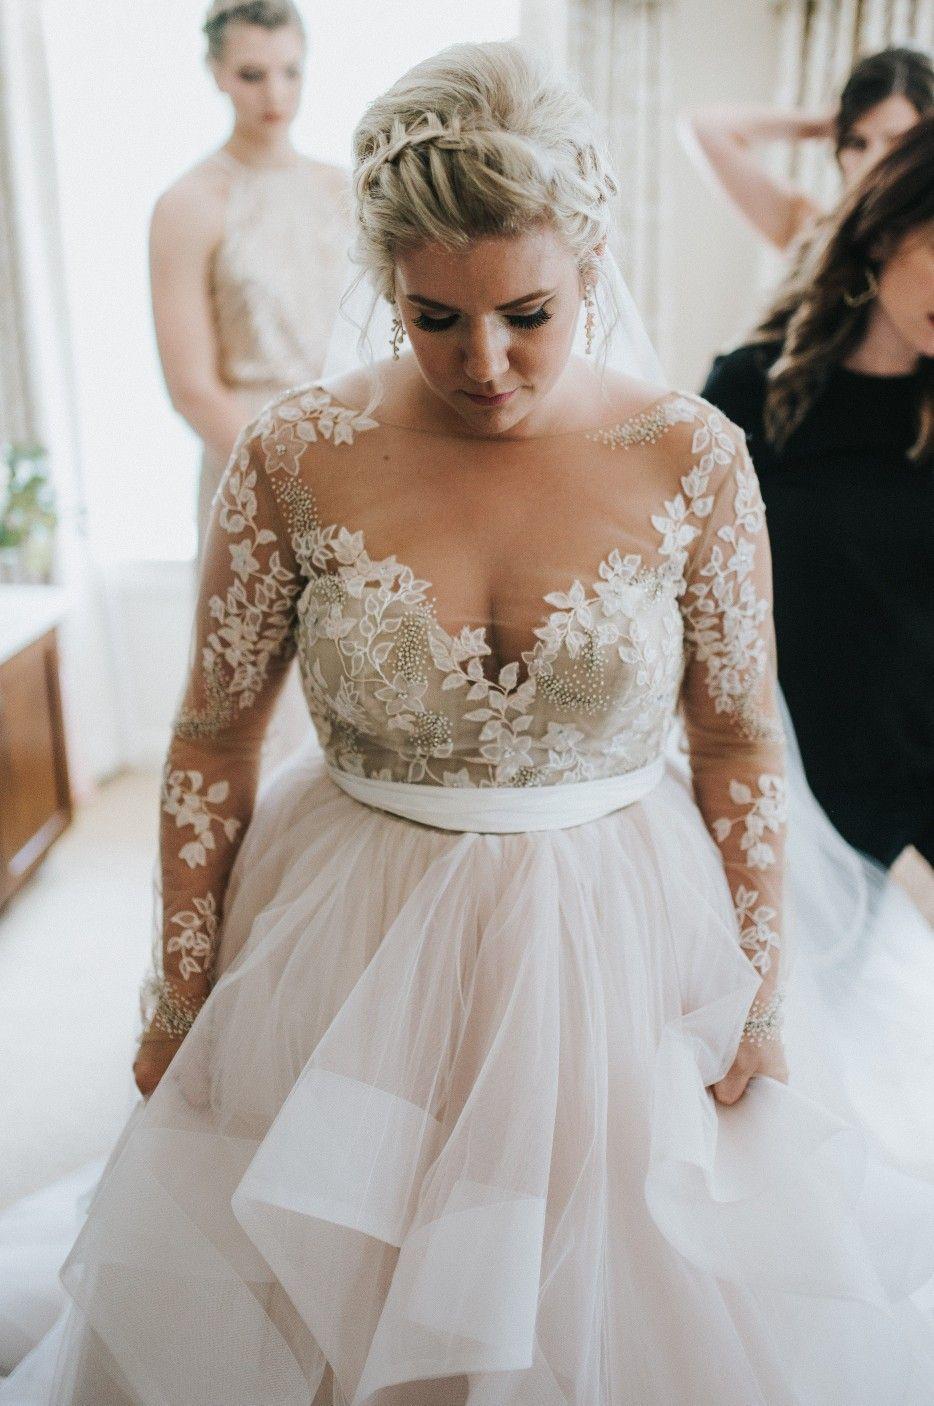 ac4e637118f hayley paige lorelei lorelei gown blush wedding dress ball gown wedding  dream dress